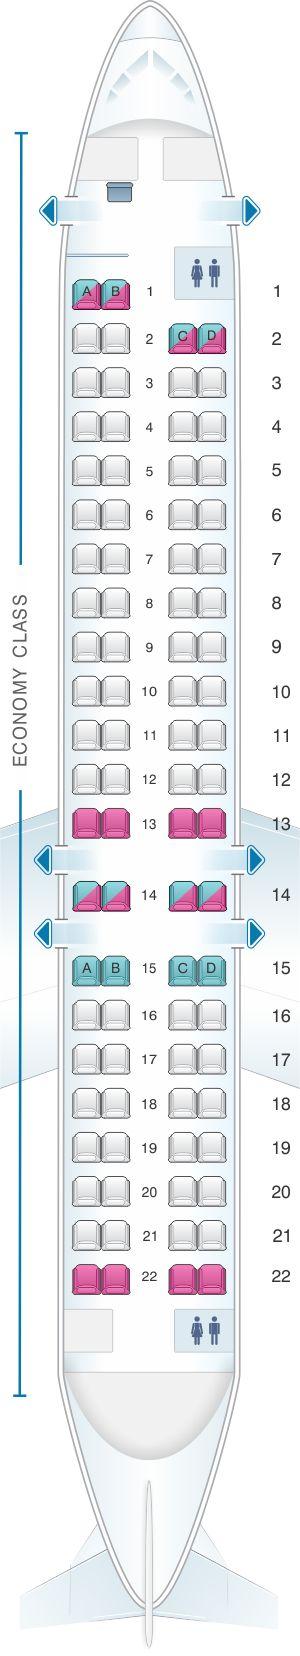 Seat Map Adria Airways Bombardier CRJ 900LR